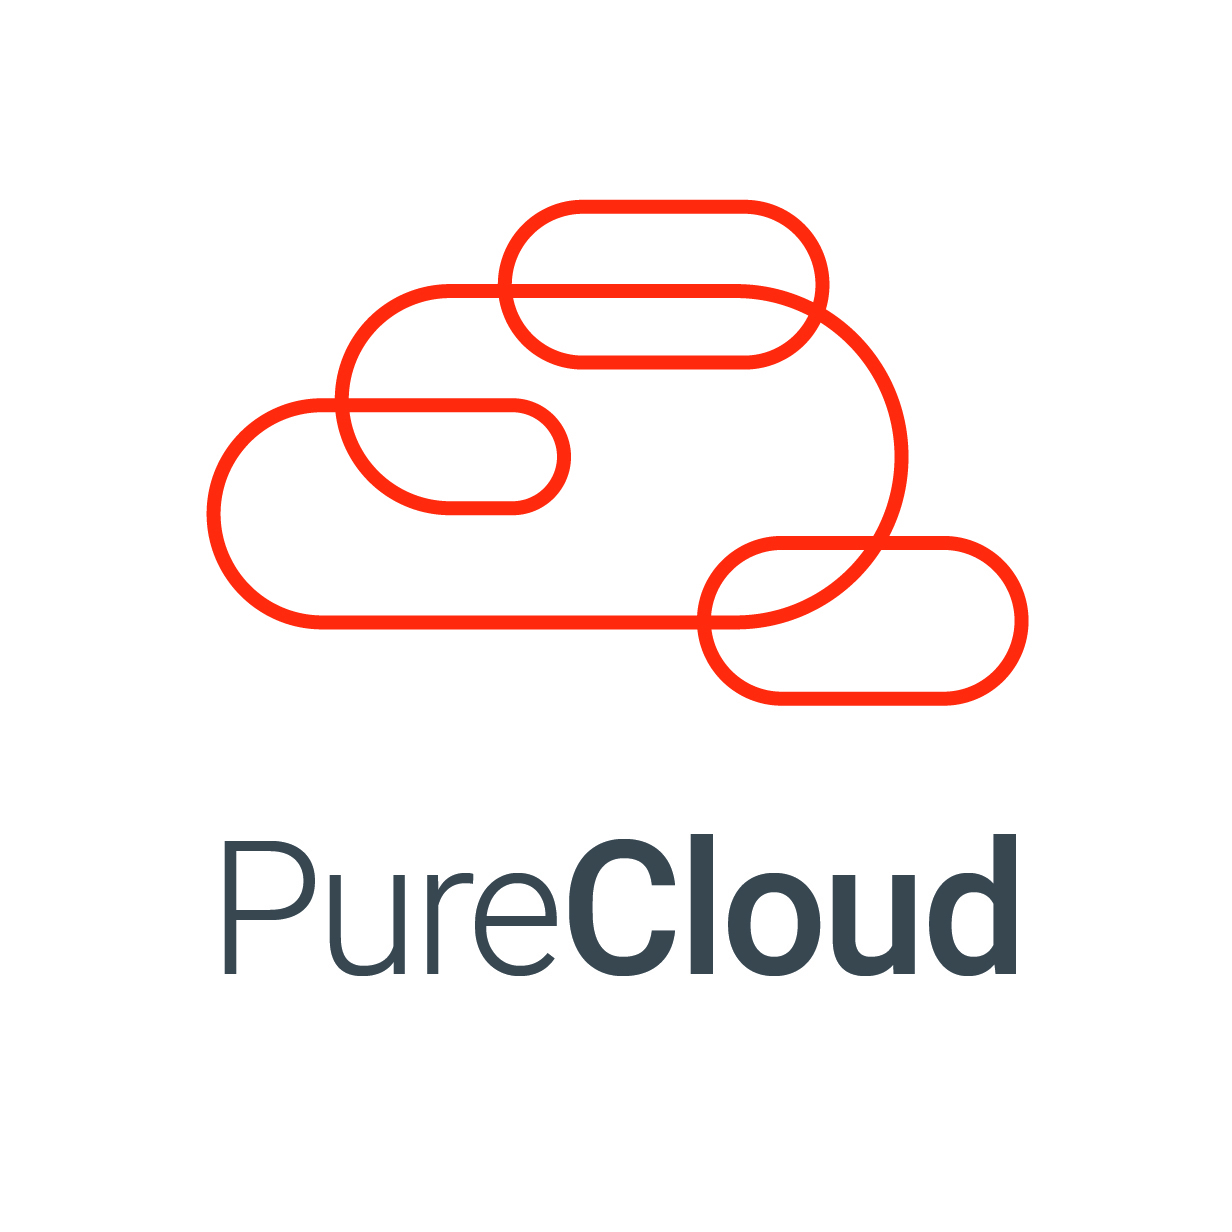 Genesys PureCloud logo